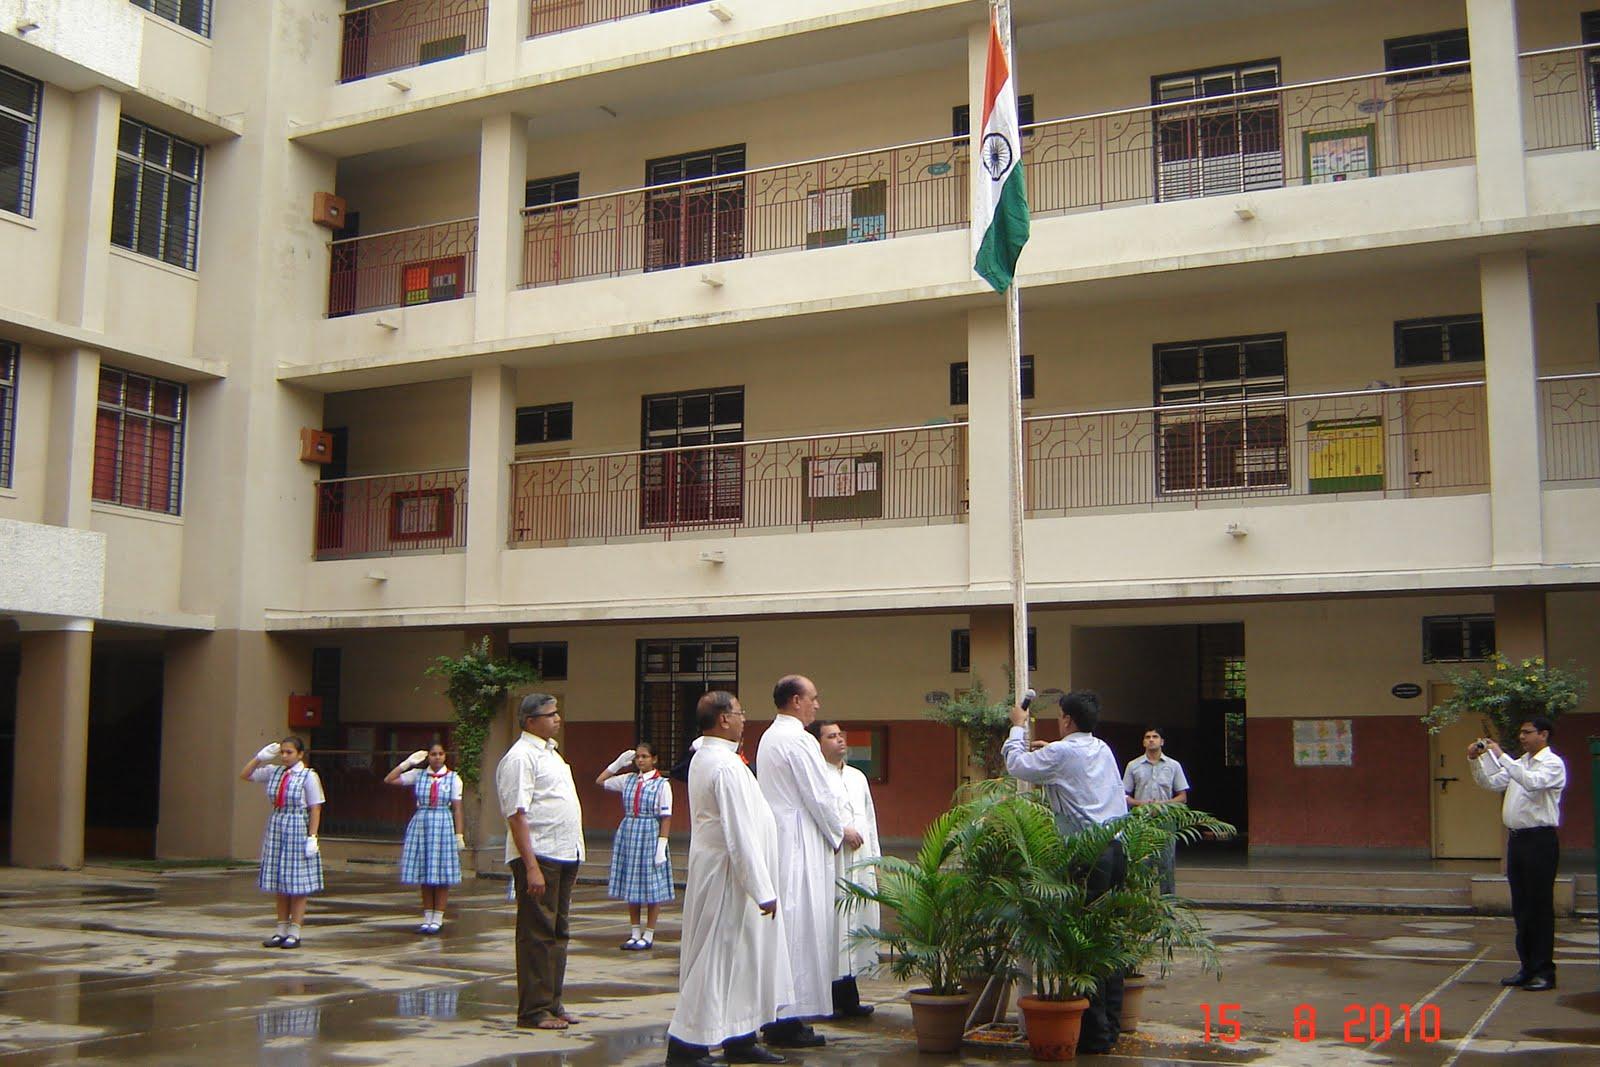 Collège Don Bosco: Don Bosco School, Nerul